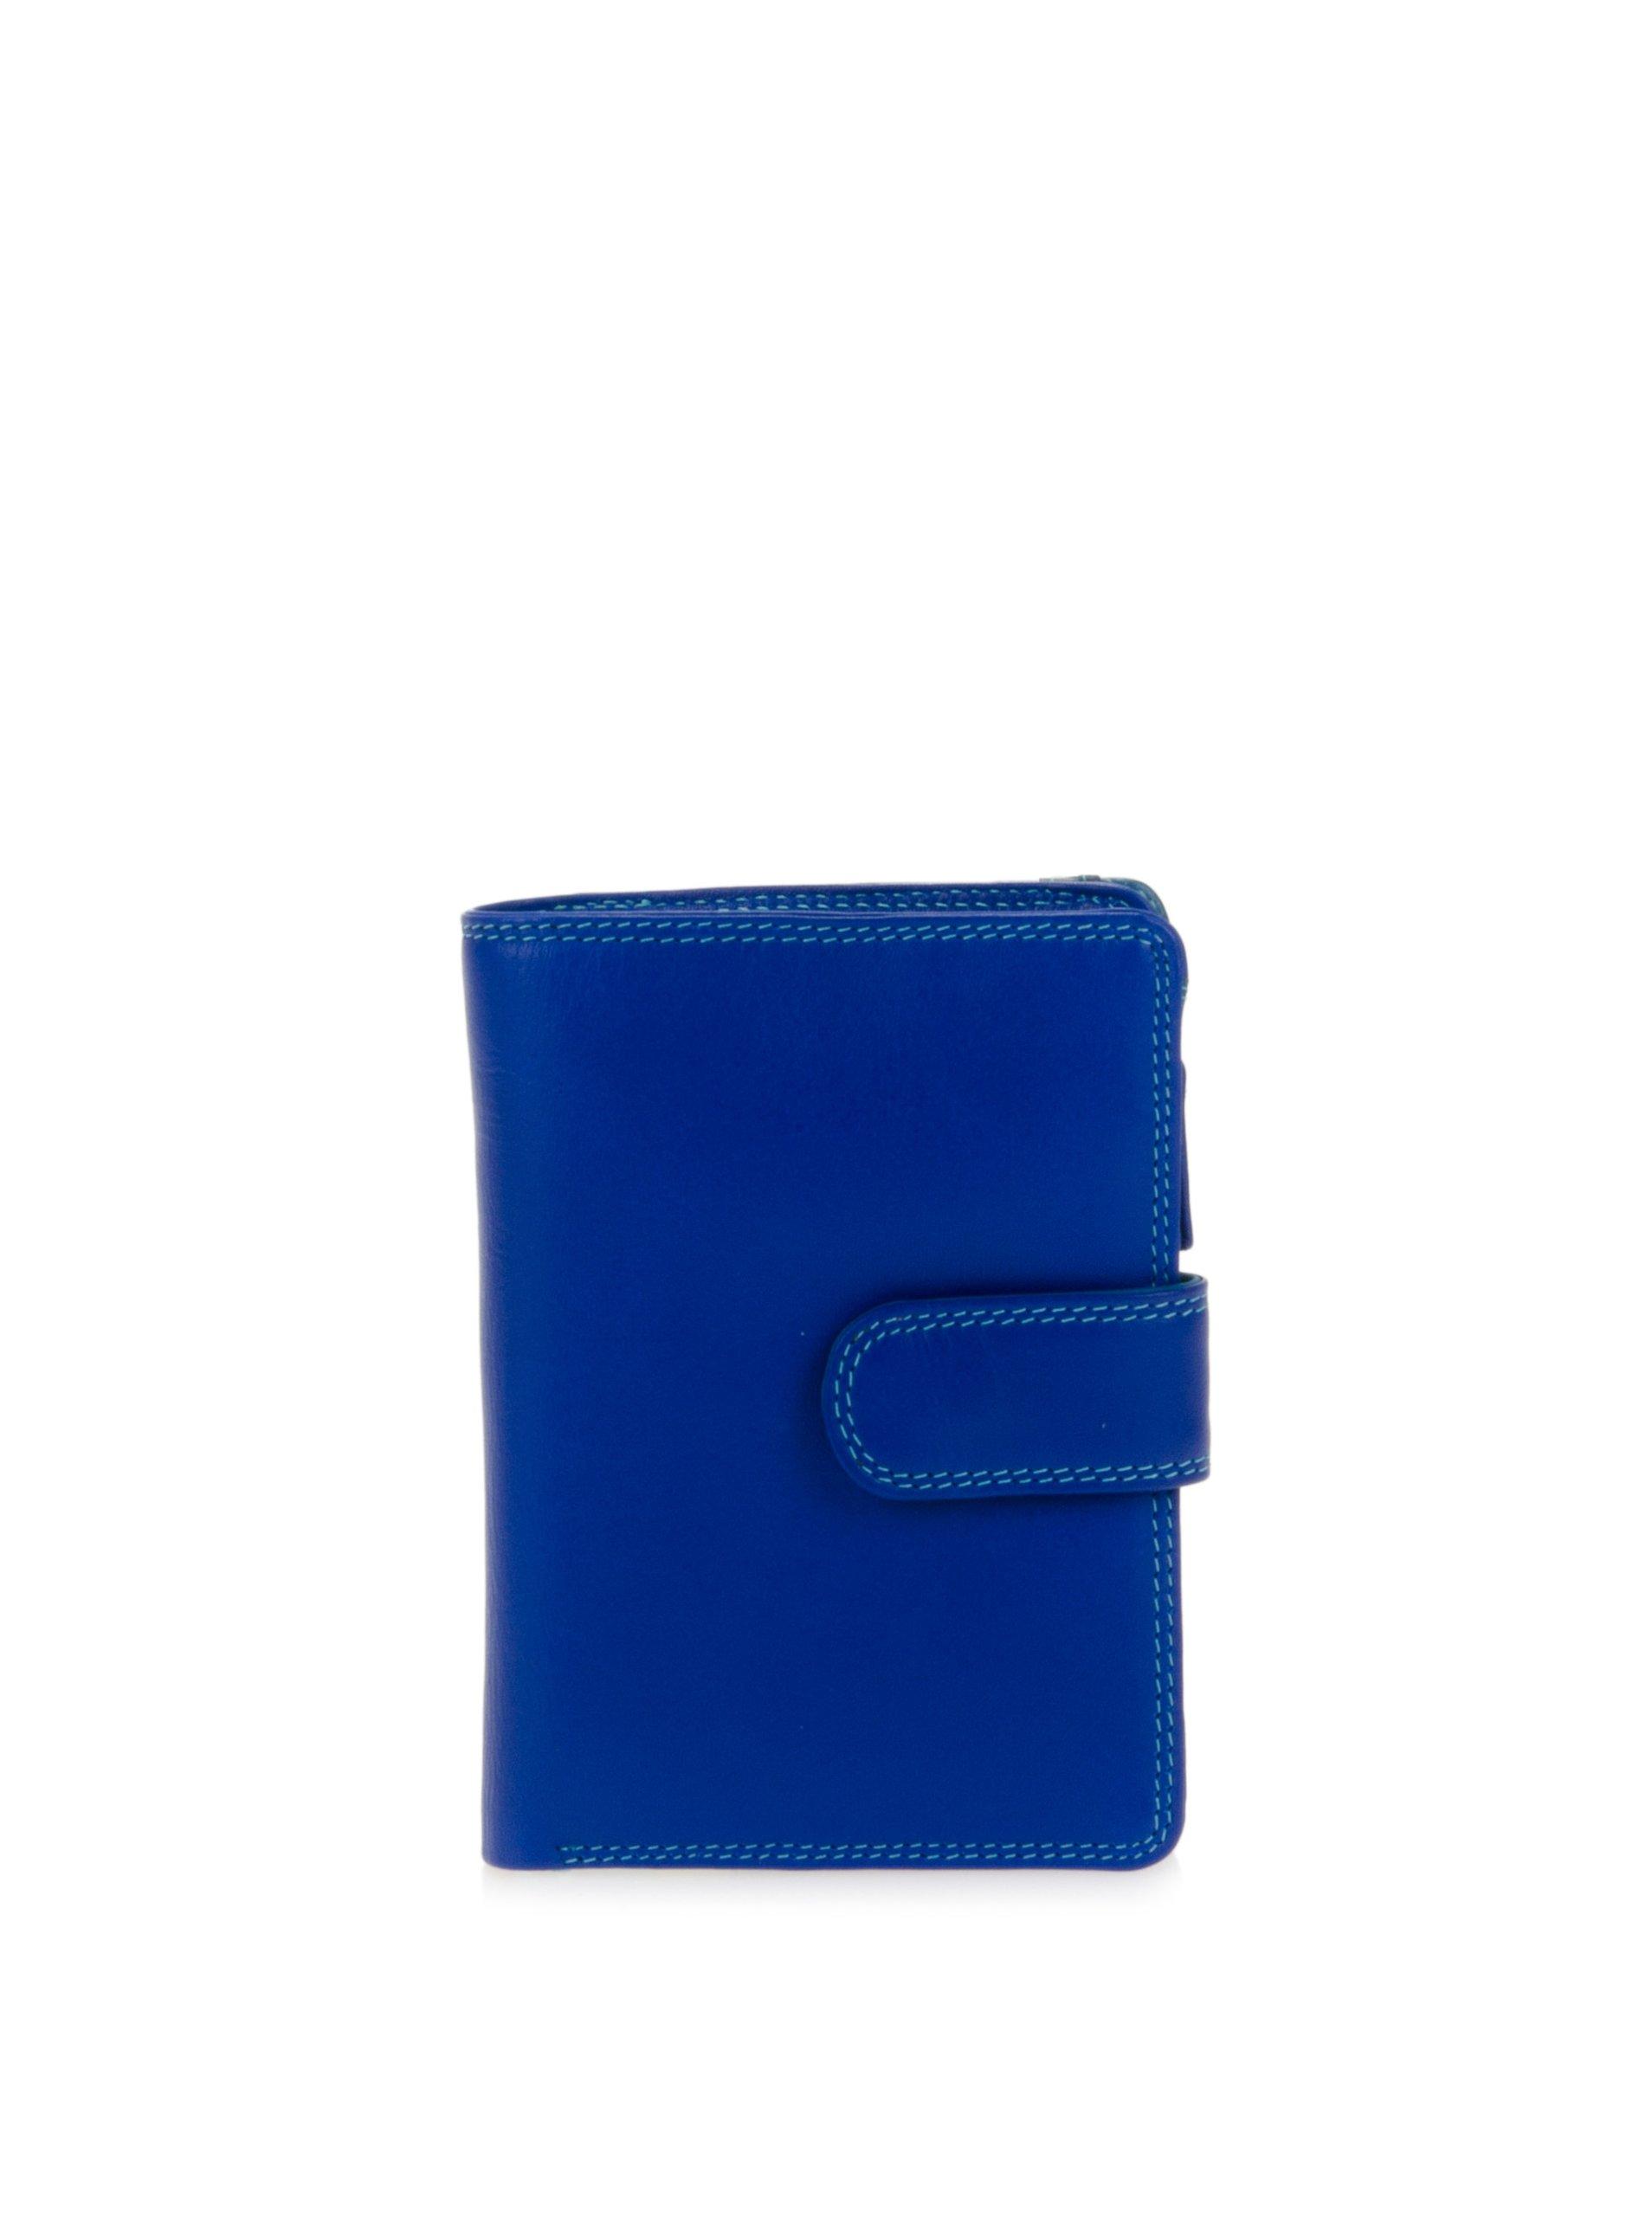 Peněženka Mywalit Medium 10 C/C Wallet w/Zip purse Seascape